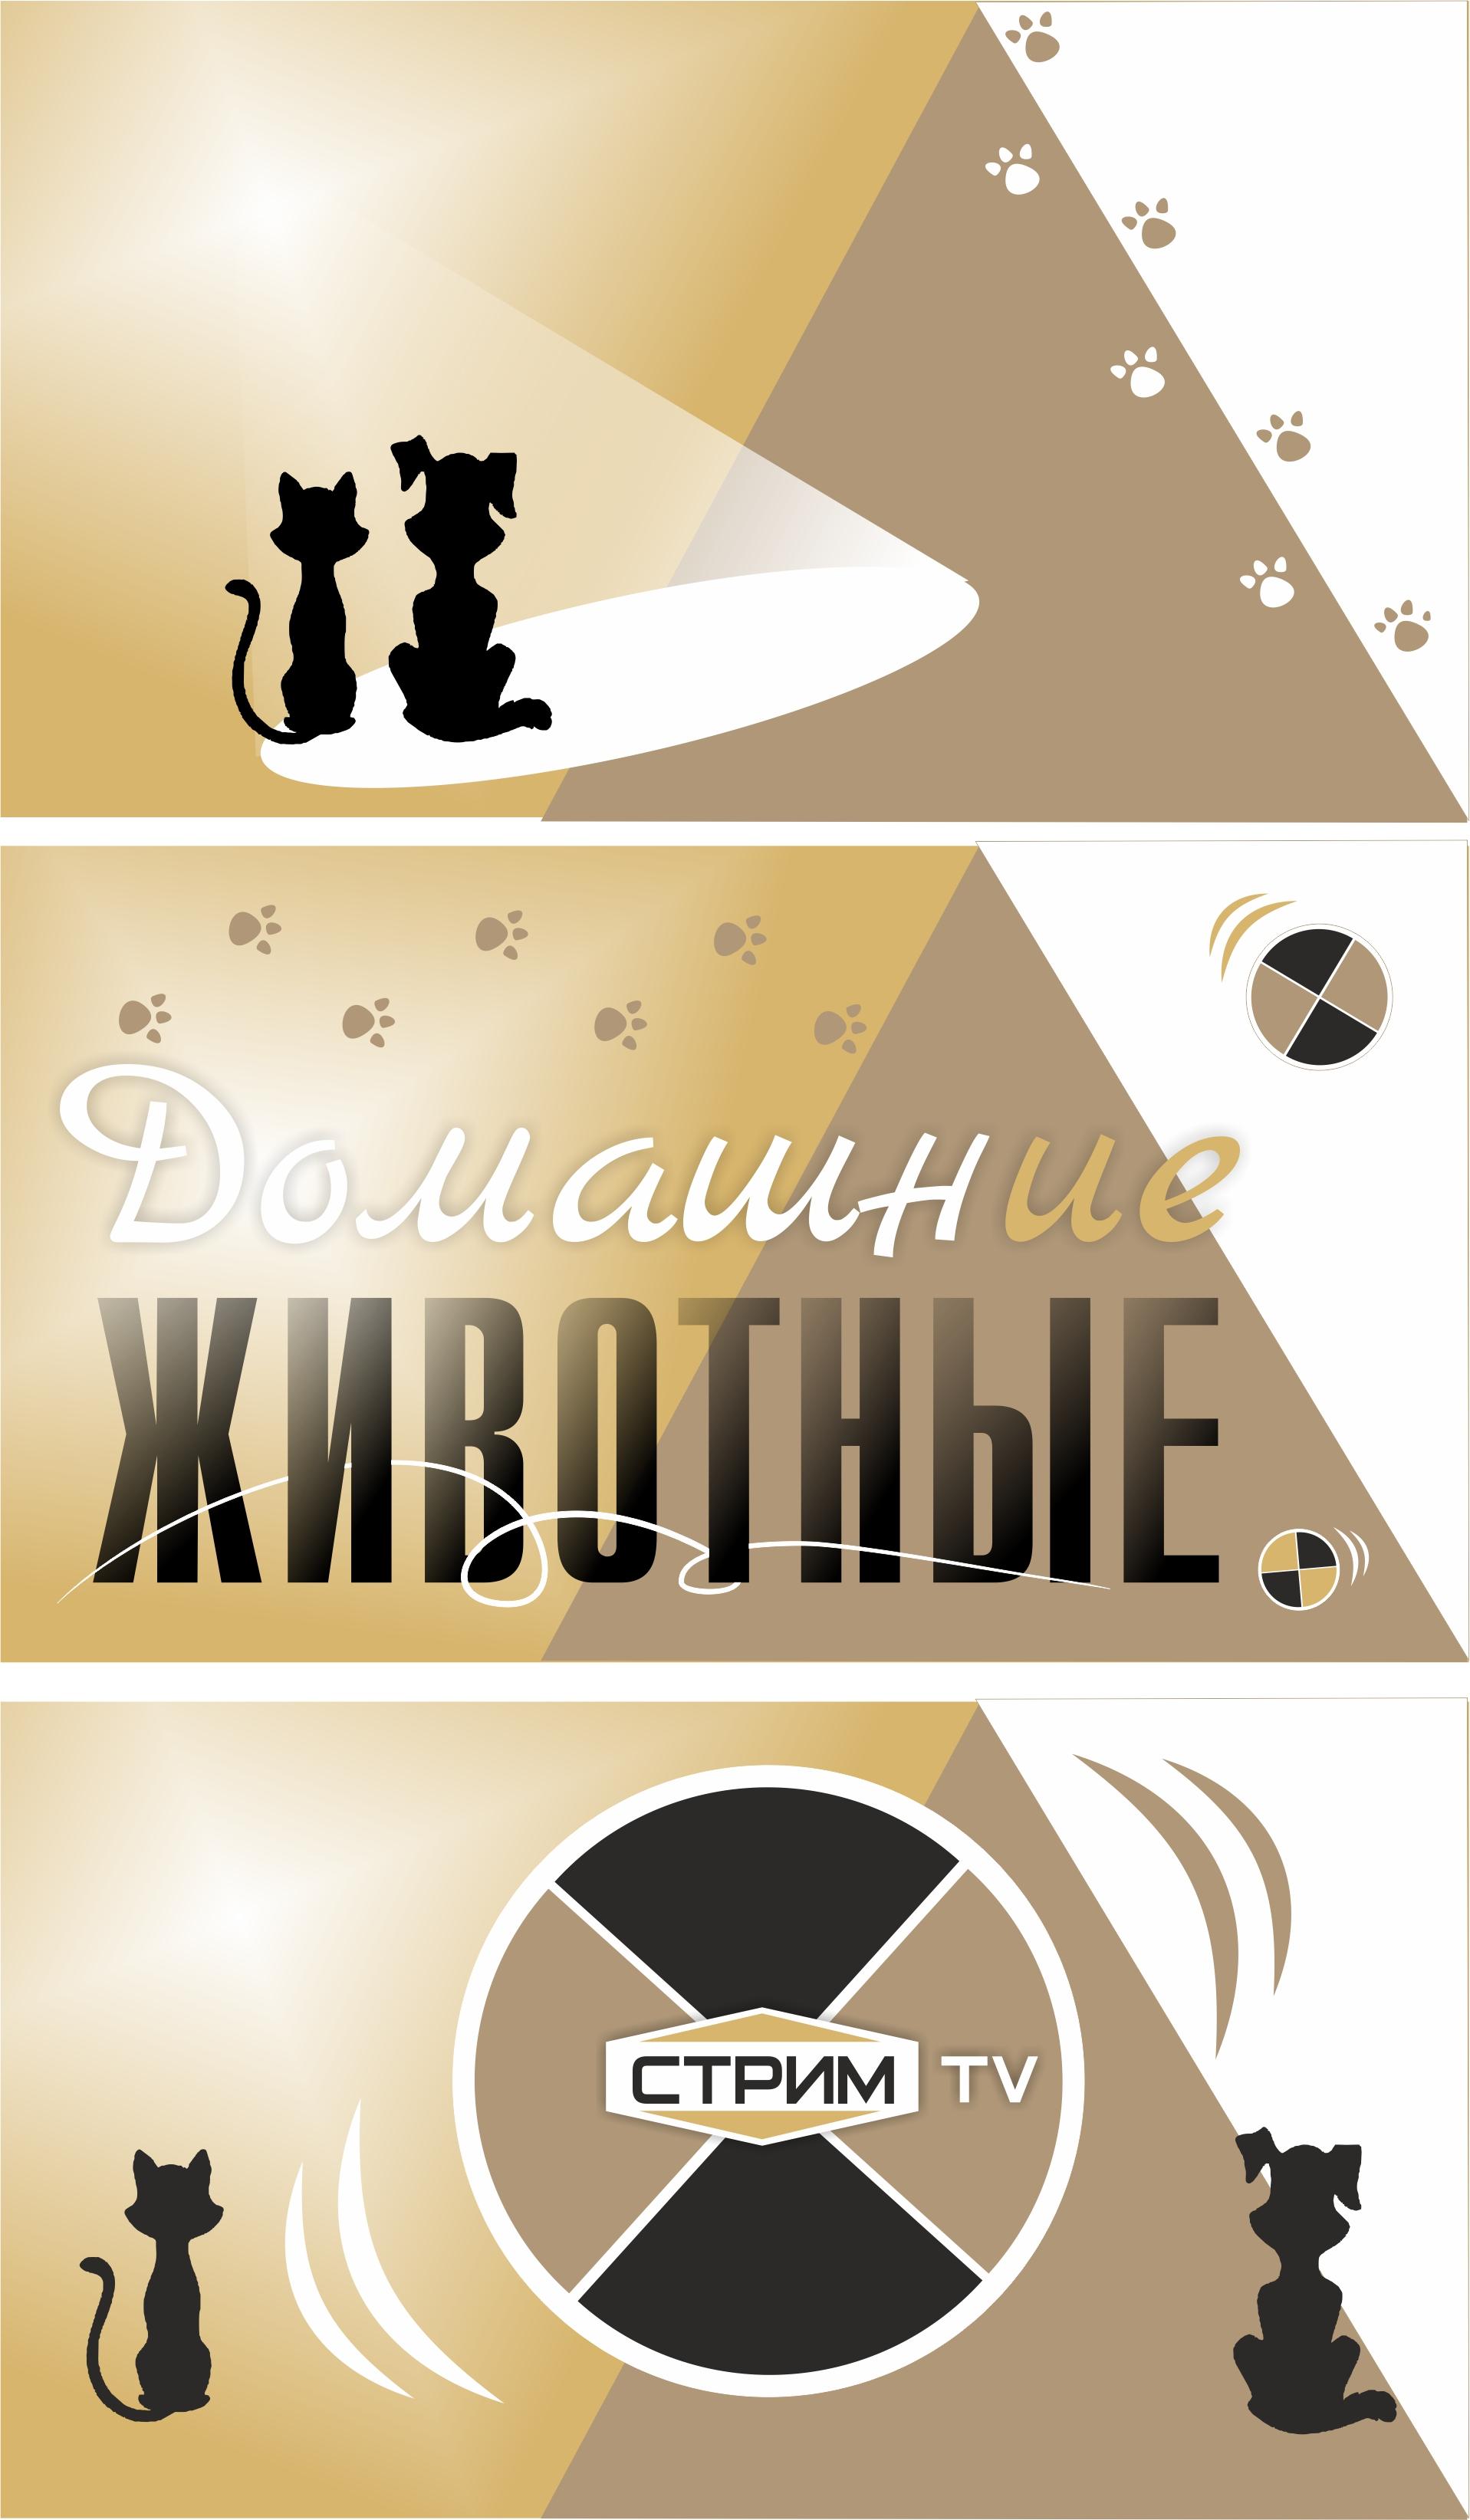 Создание концепции заставки и логотипа (телеканал) фото f_493566ec5465e795.jpg